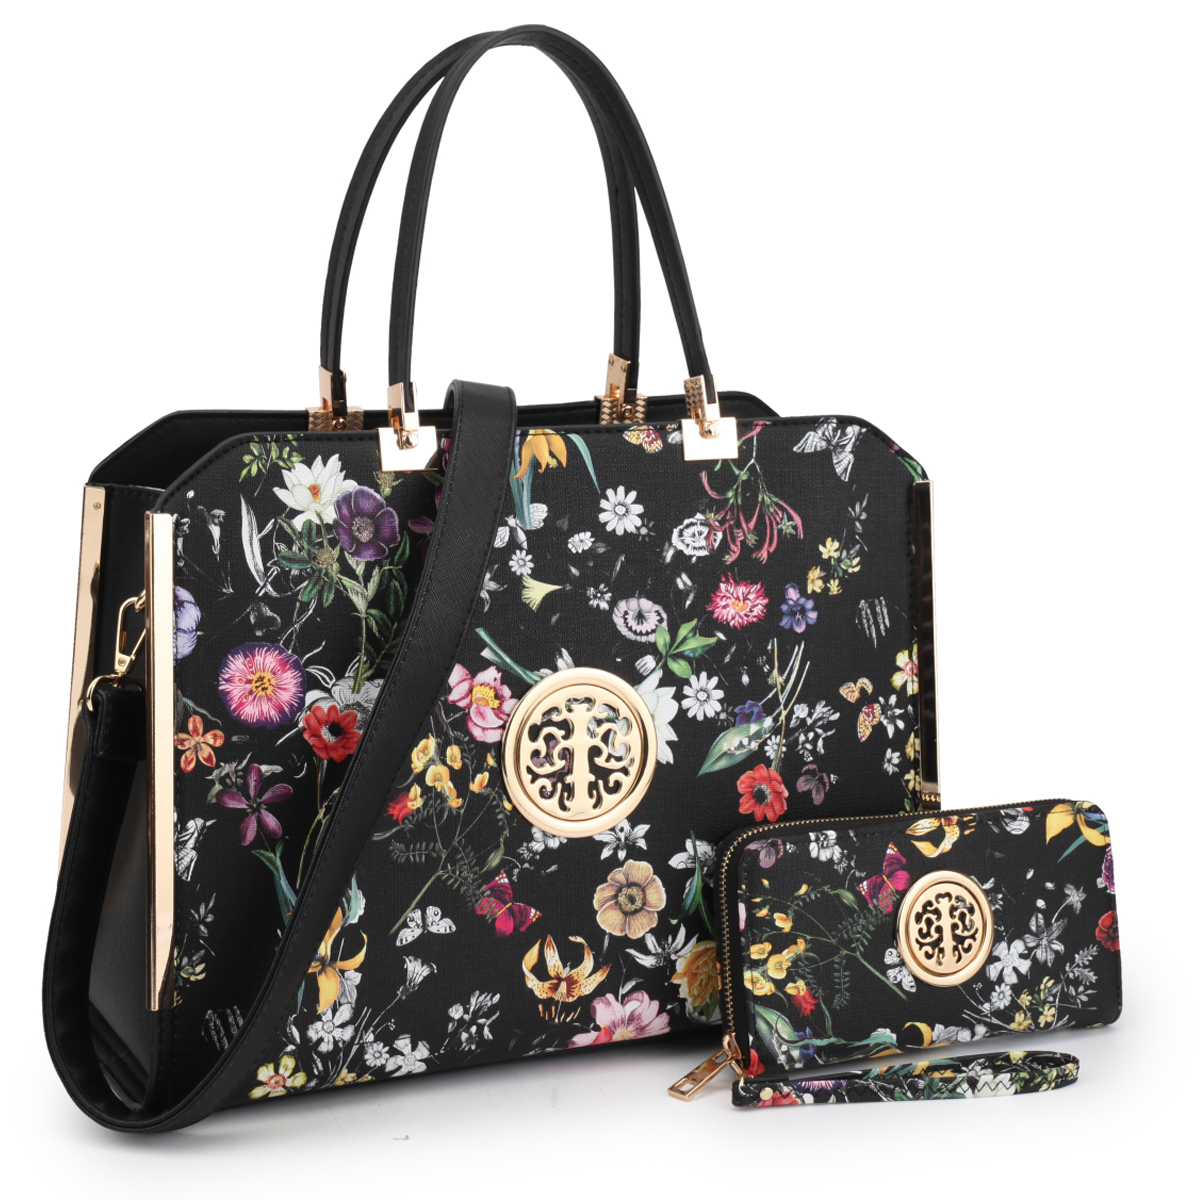 Dasein Womens Fashion Designer Purse Flower Pattern Faux Leather Briefcase with Matching Wallet - Black Flower photo